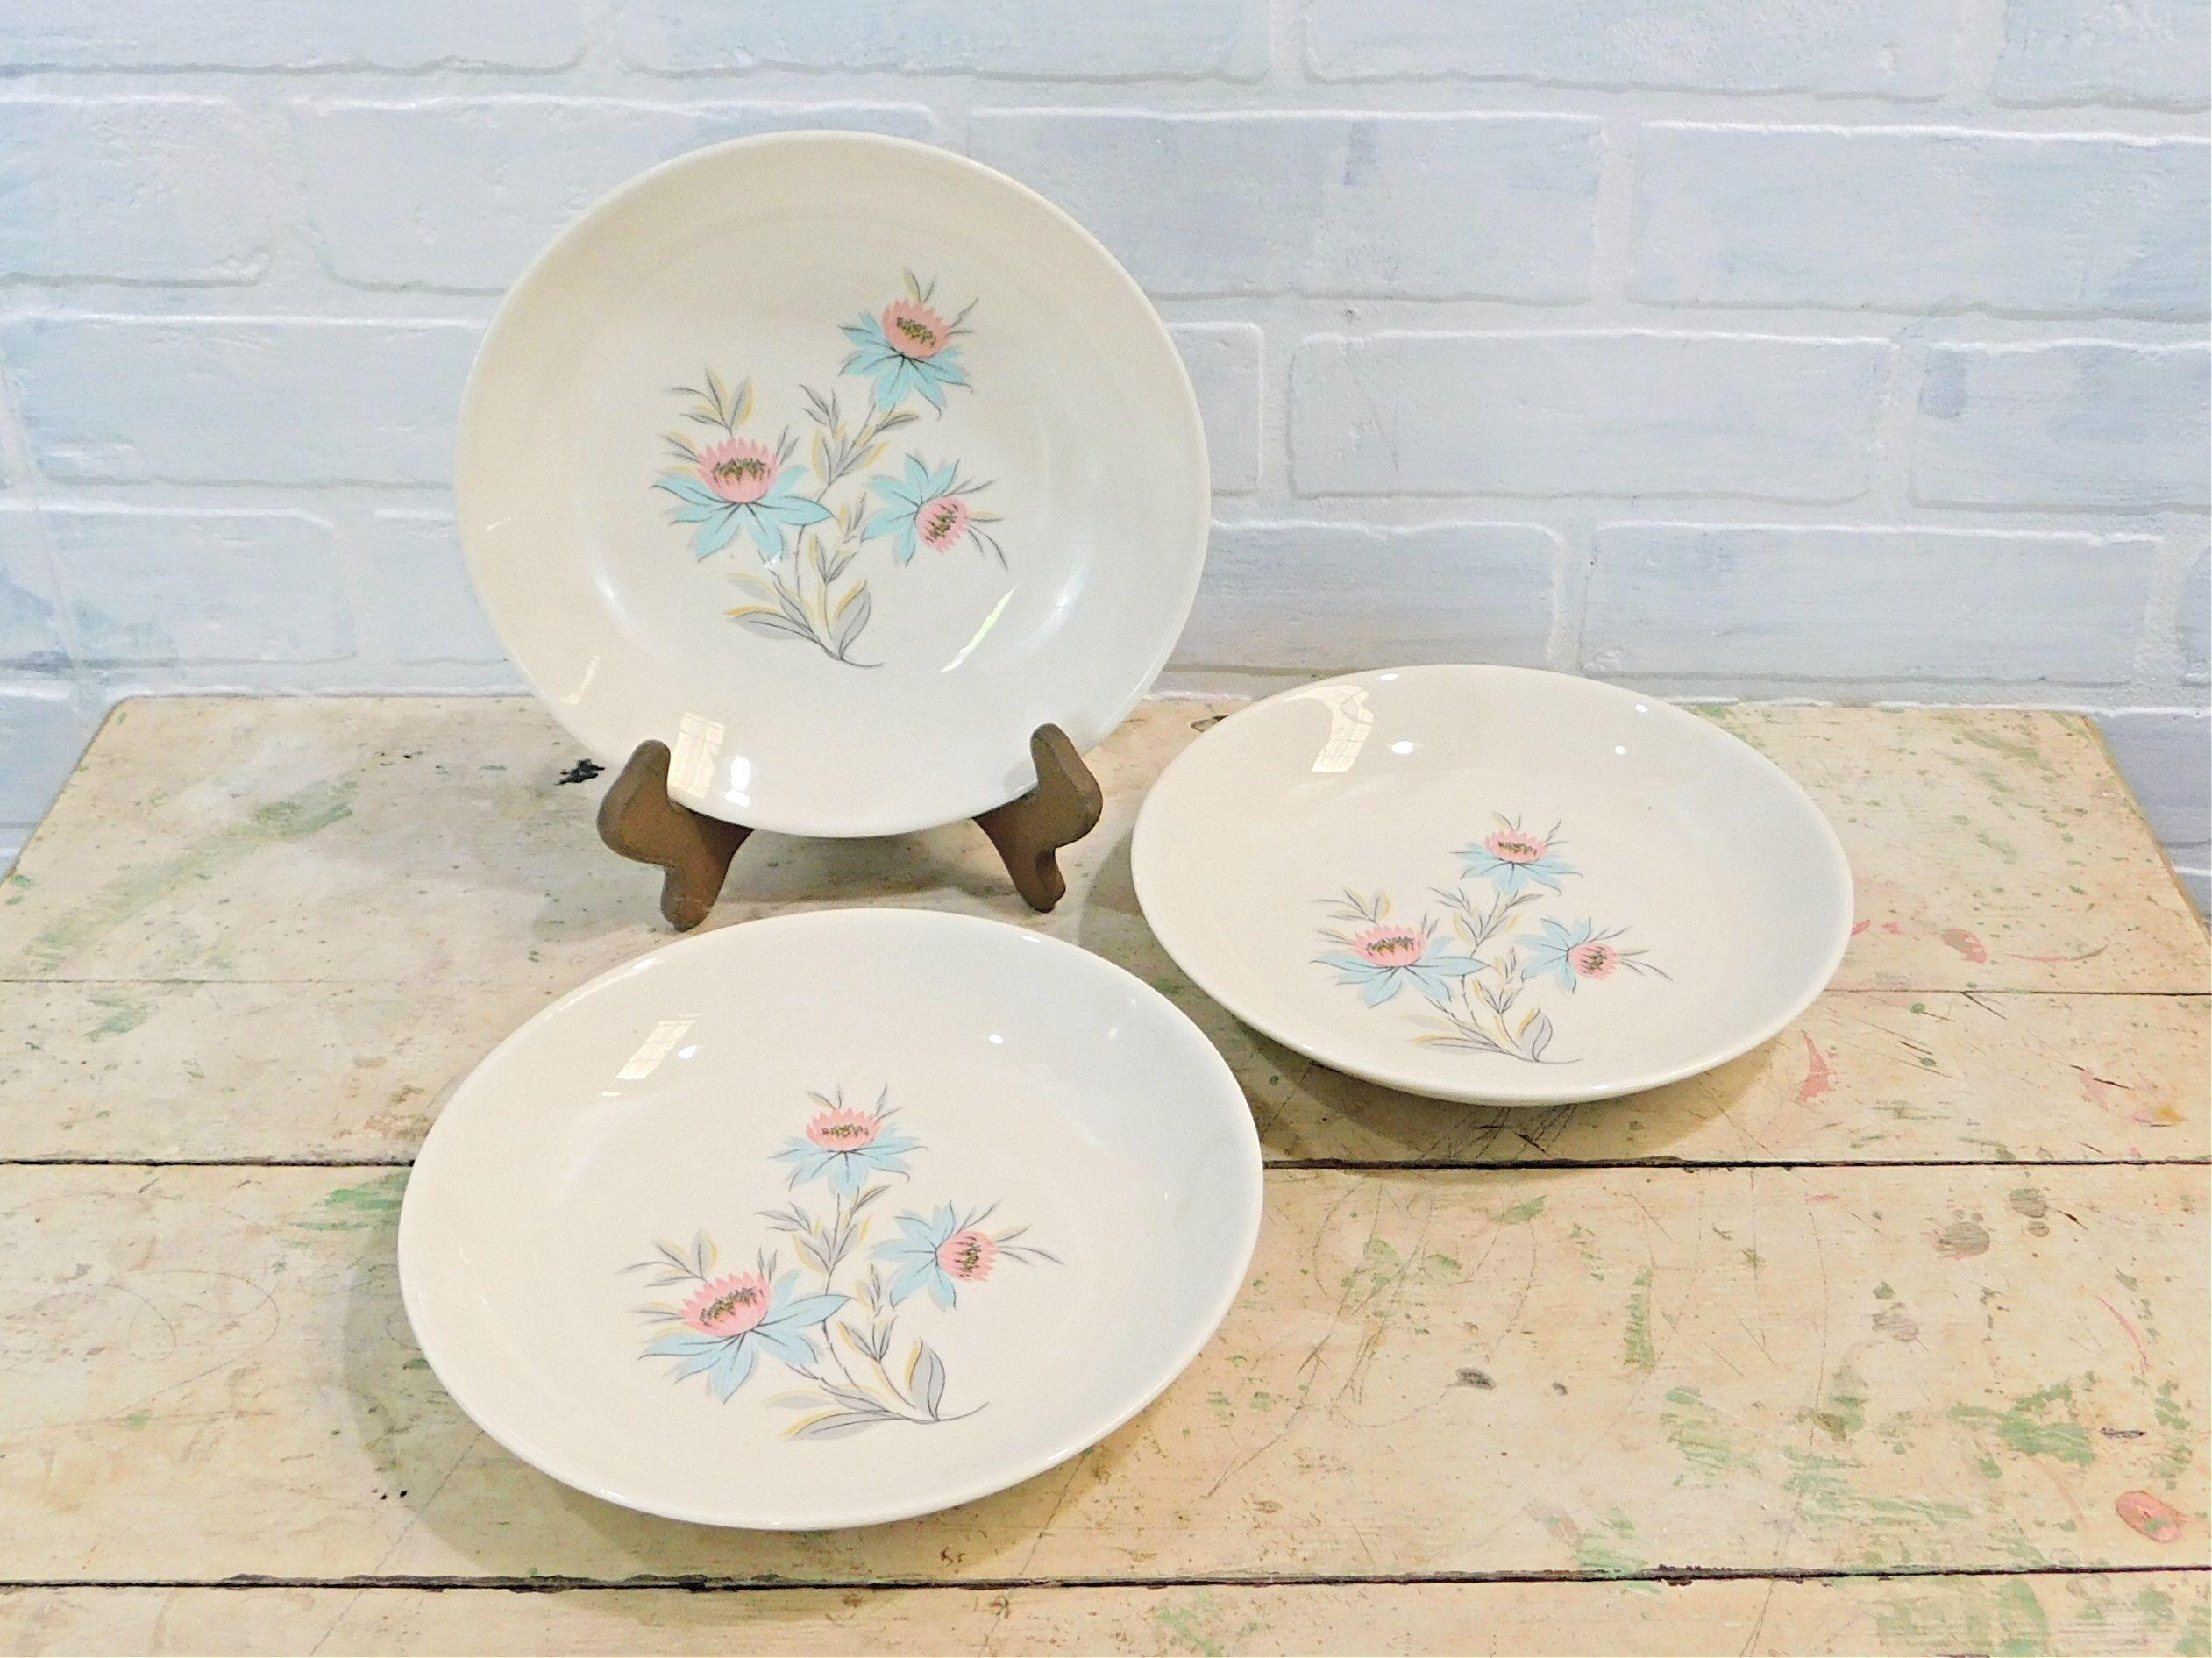 Steubenville Pottery Fairlane Pattern, 3 Soup, Salad, Cereal Bowls, Vintage